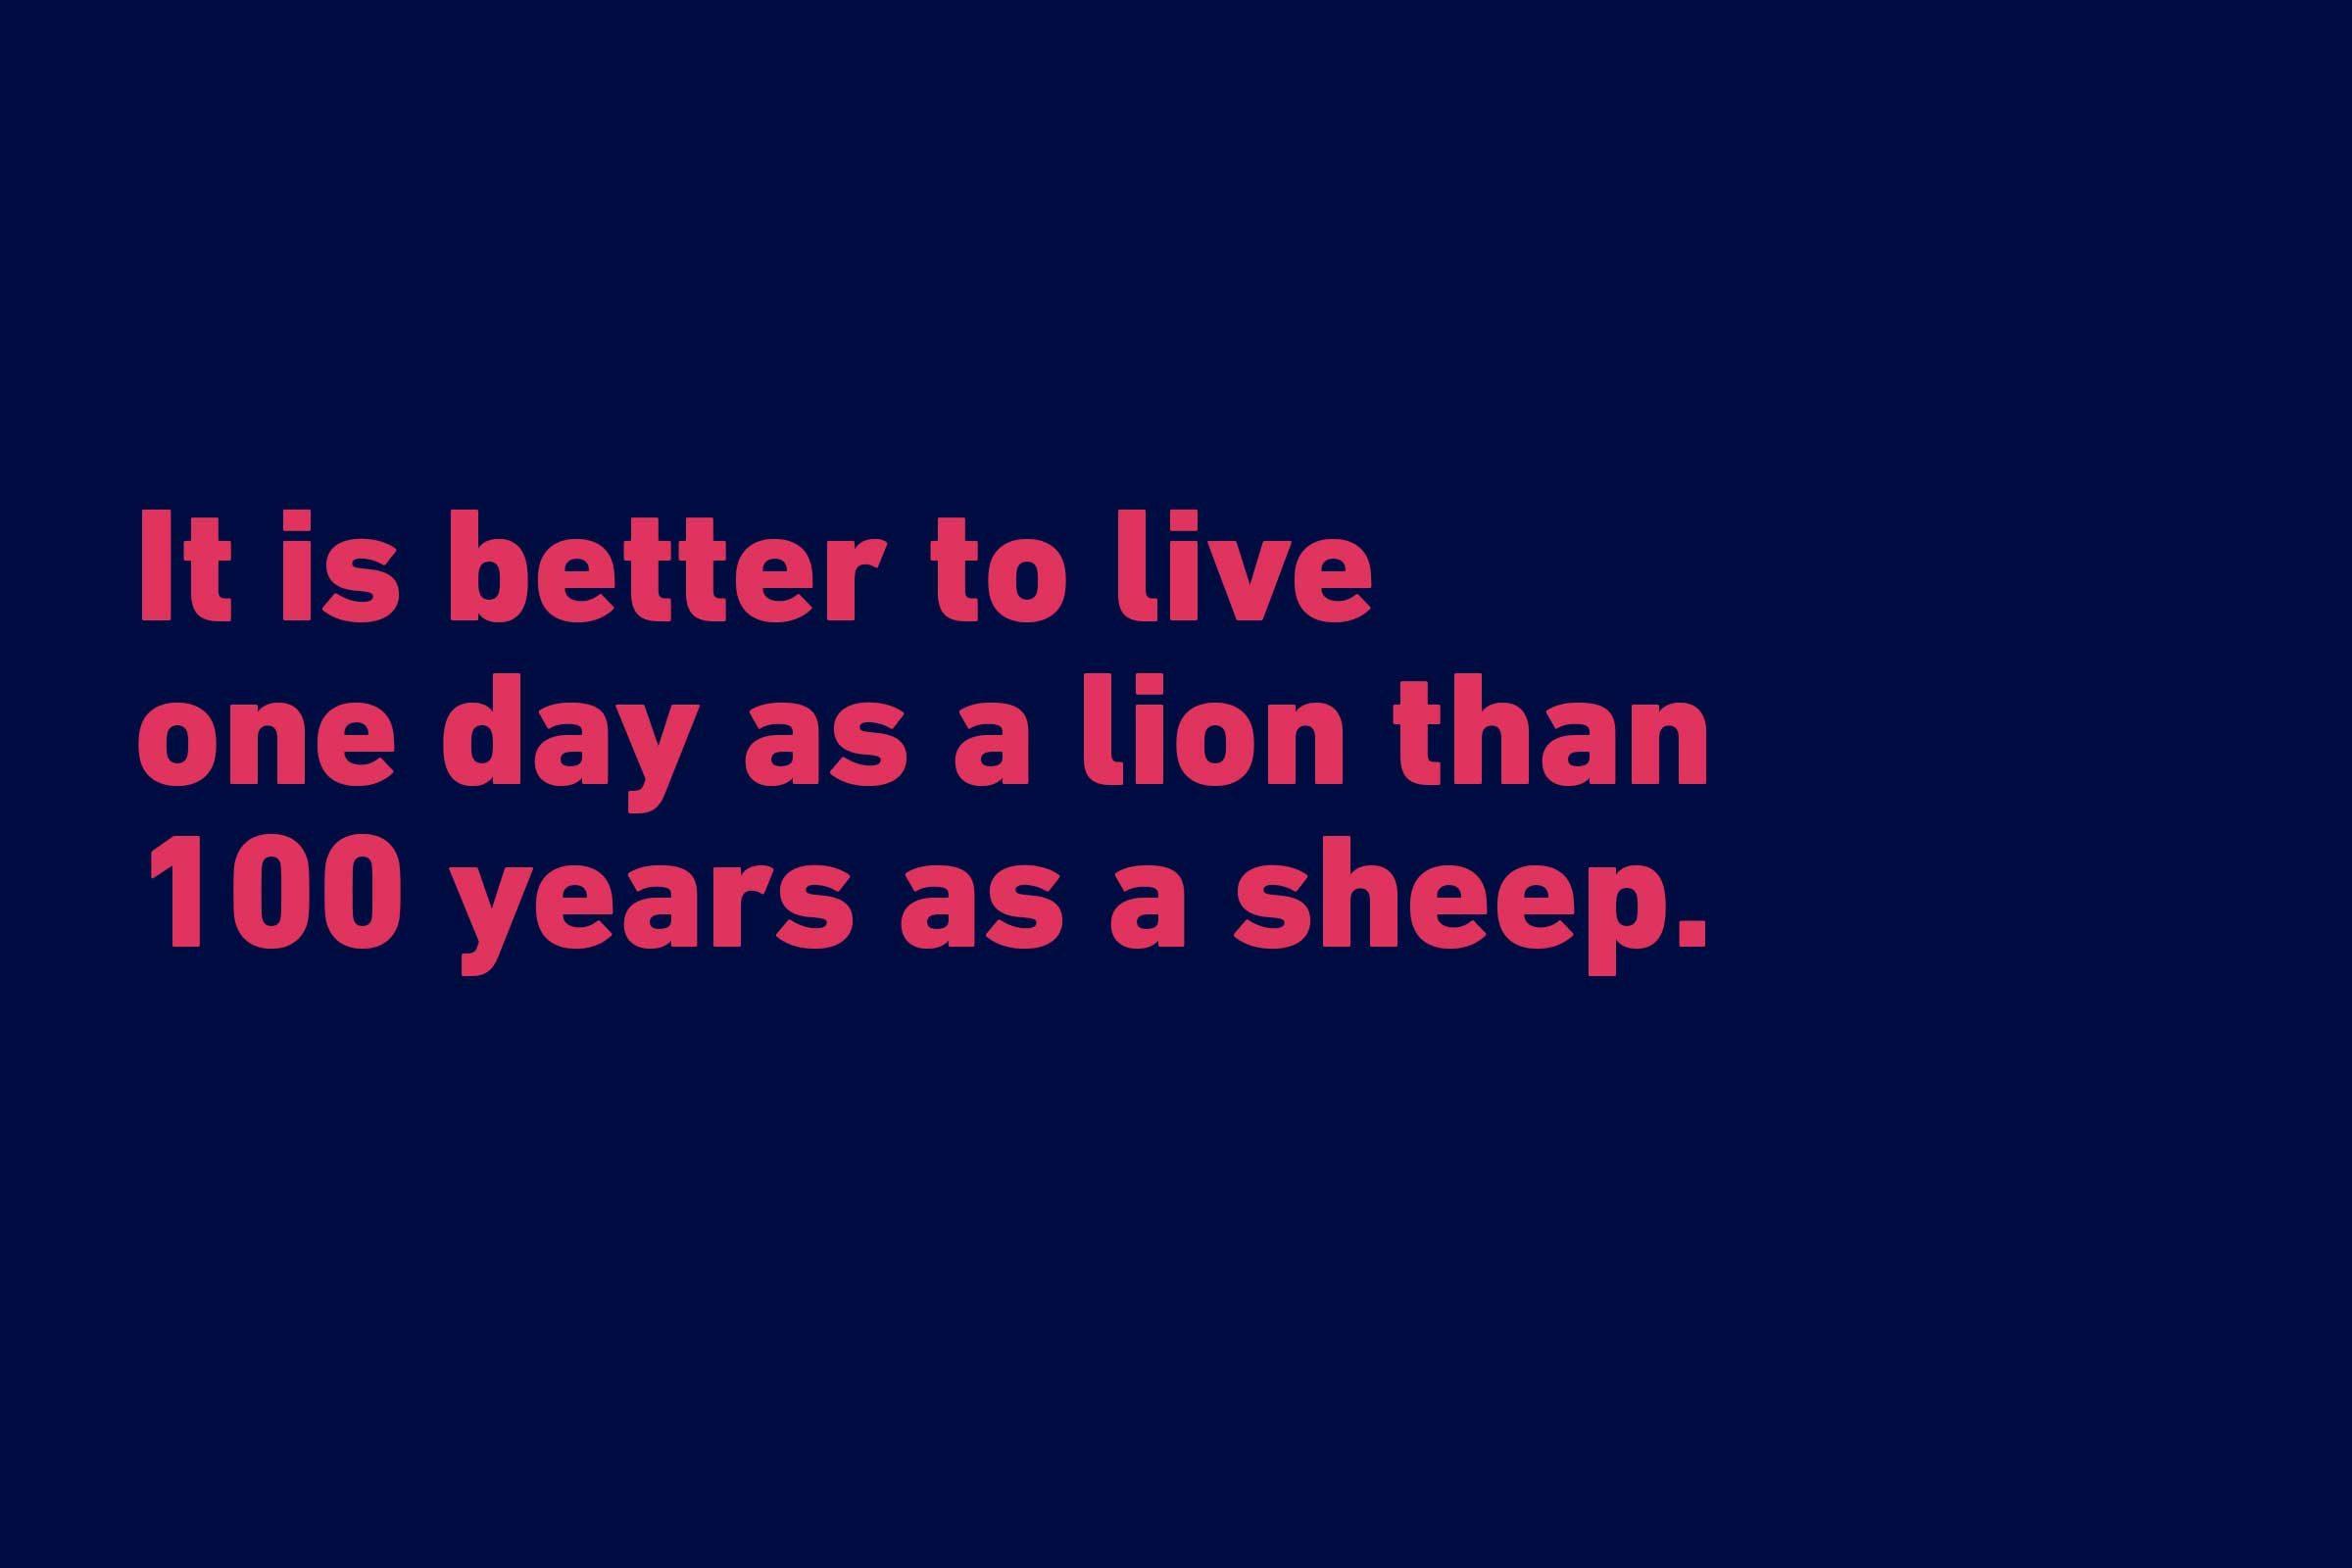 Donald Trump funny quote